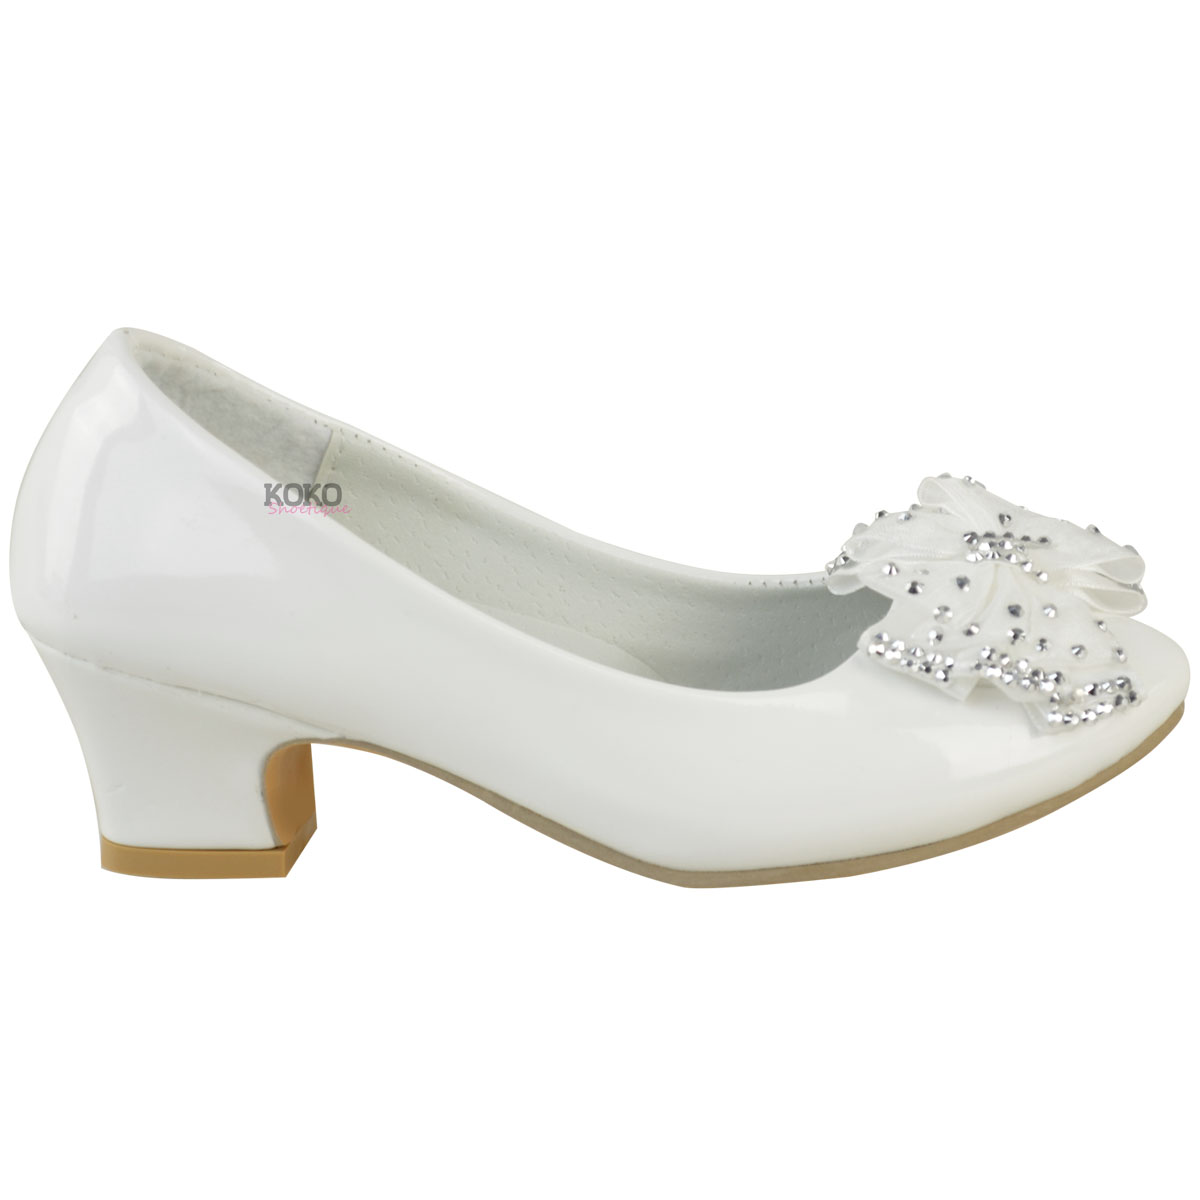 Girls Childrens Kids Low Heel Diamante Bow Wedding Flower Party